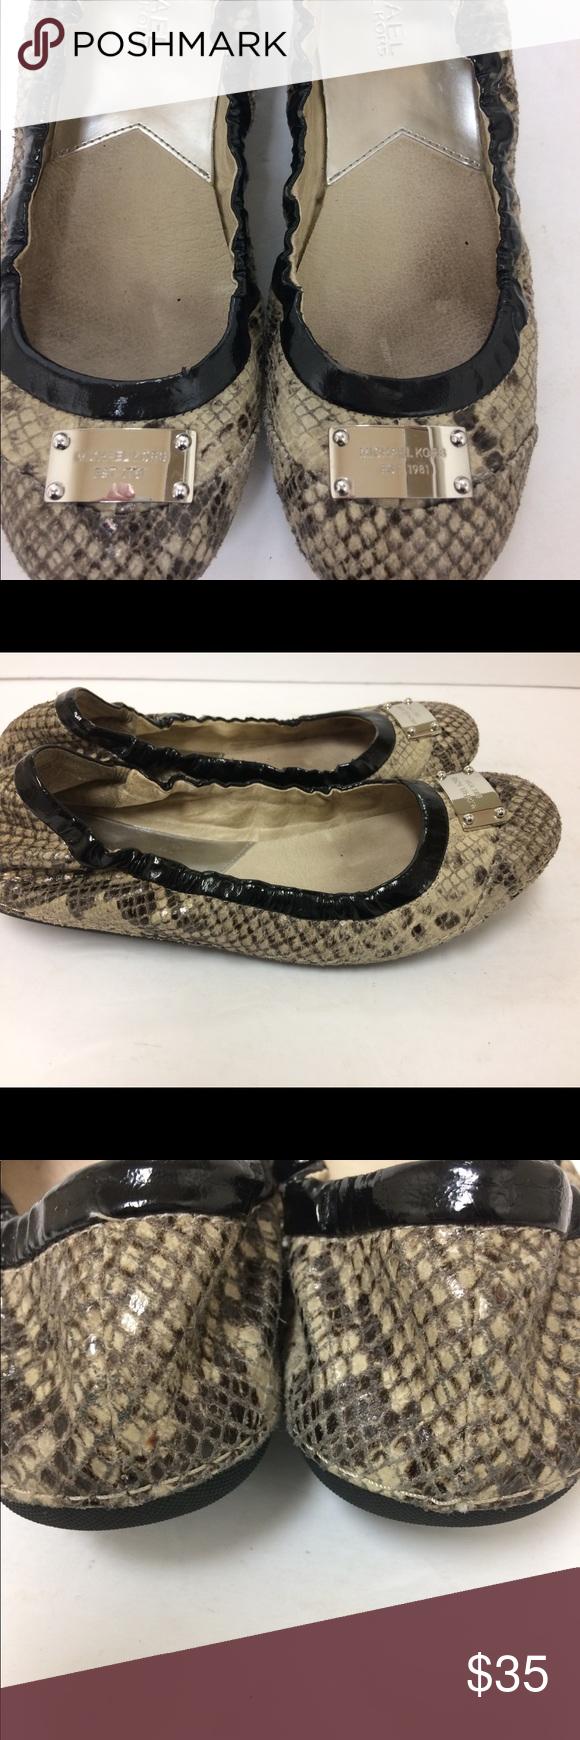 288fbbc8f921 Michael Kors Python ballet flats size 7 Michael Kors Python ballet flats.  Pre-owned with gentle wear. MICHAEL Michael Kors Shoes Flats   Loafers